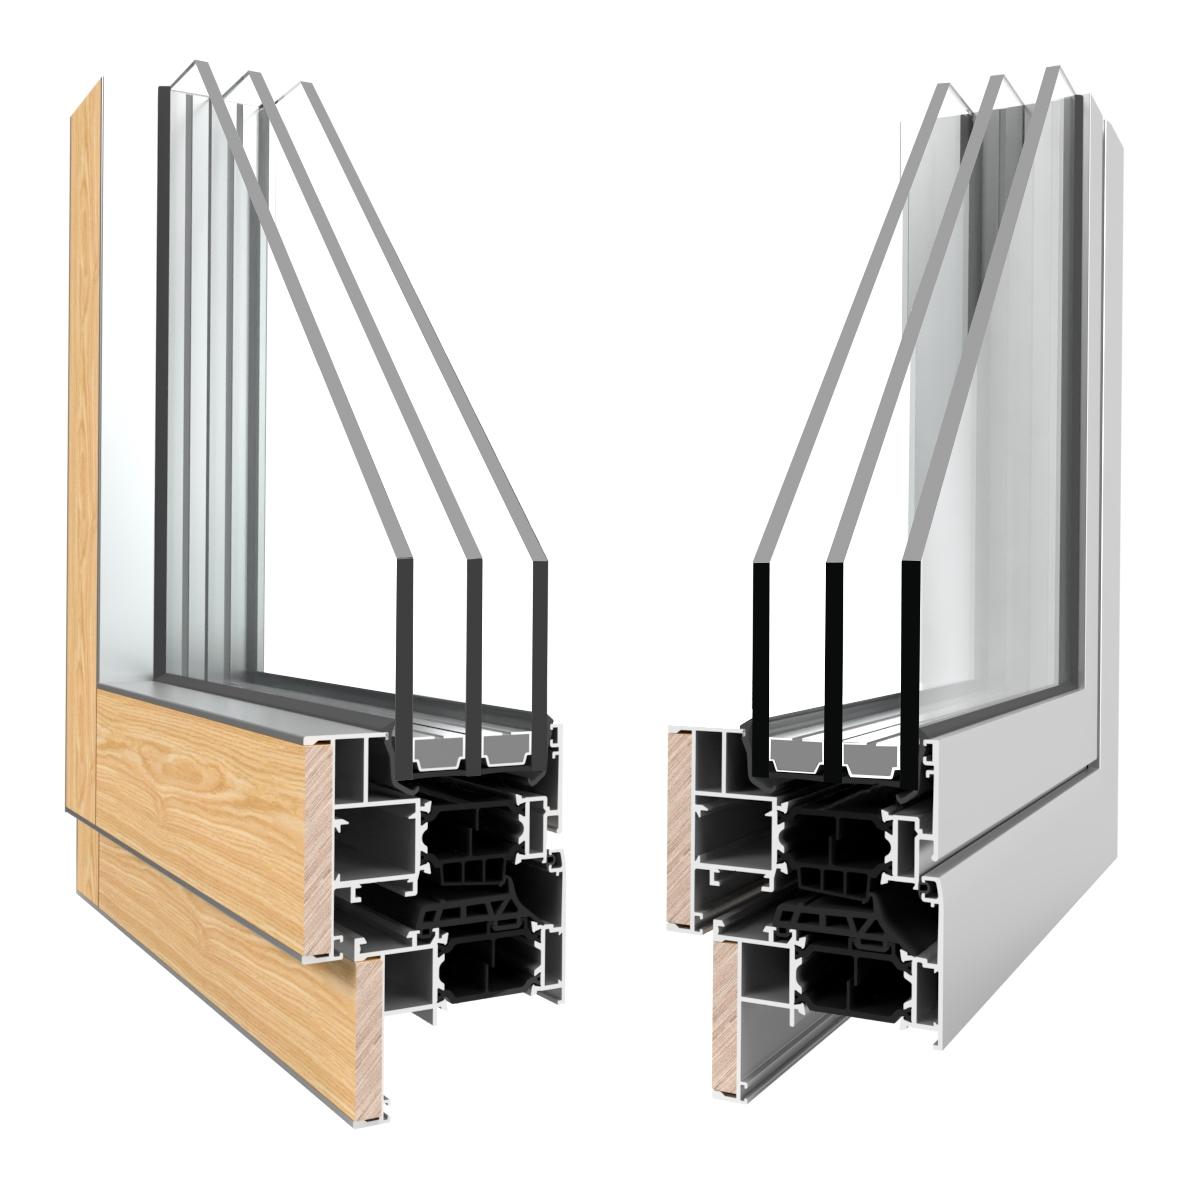 https://www.allpaint.it/wp-content/uploads/2021/07/finestre-alluminio-legno-tkwood90-allpaint.jpg